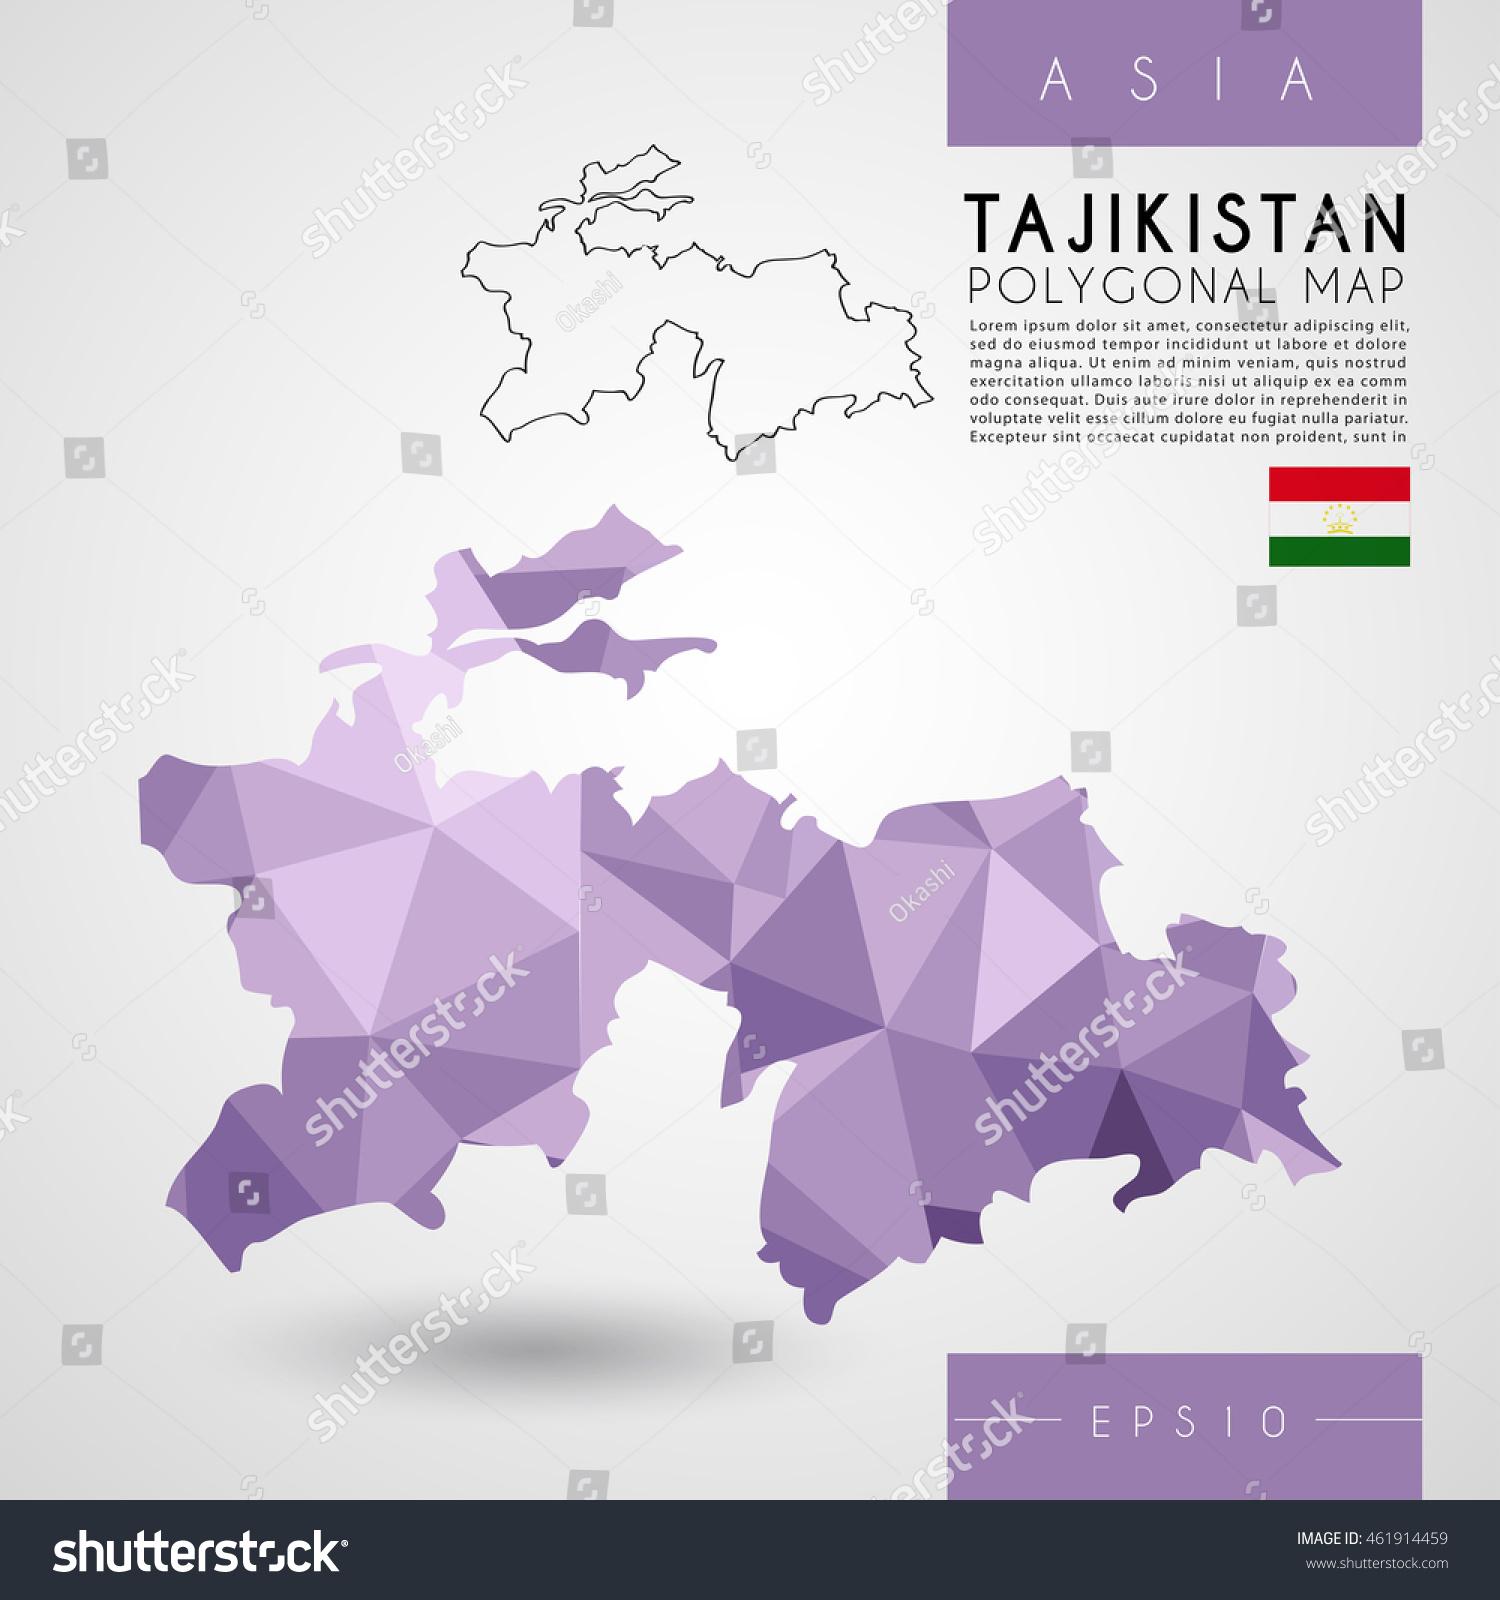 Tajikistan Low Poly Map Vector Illustration Stock Vector - Tajikistan map vector